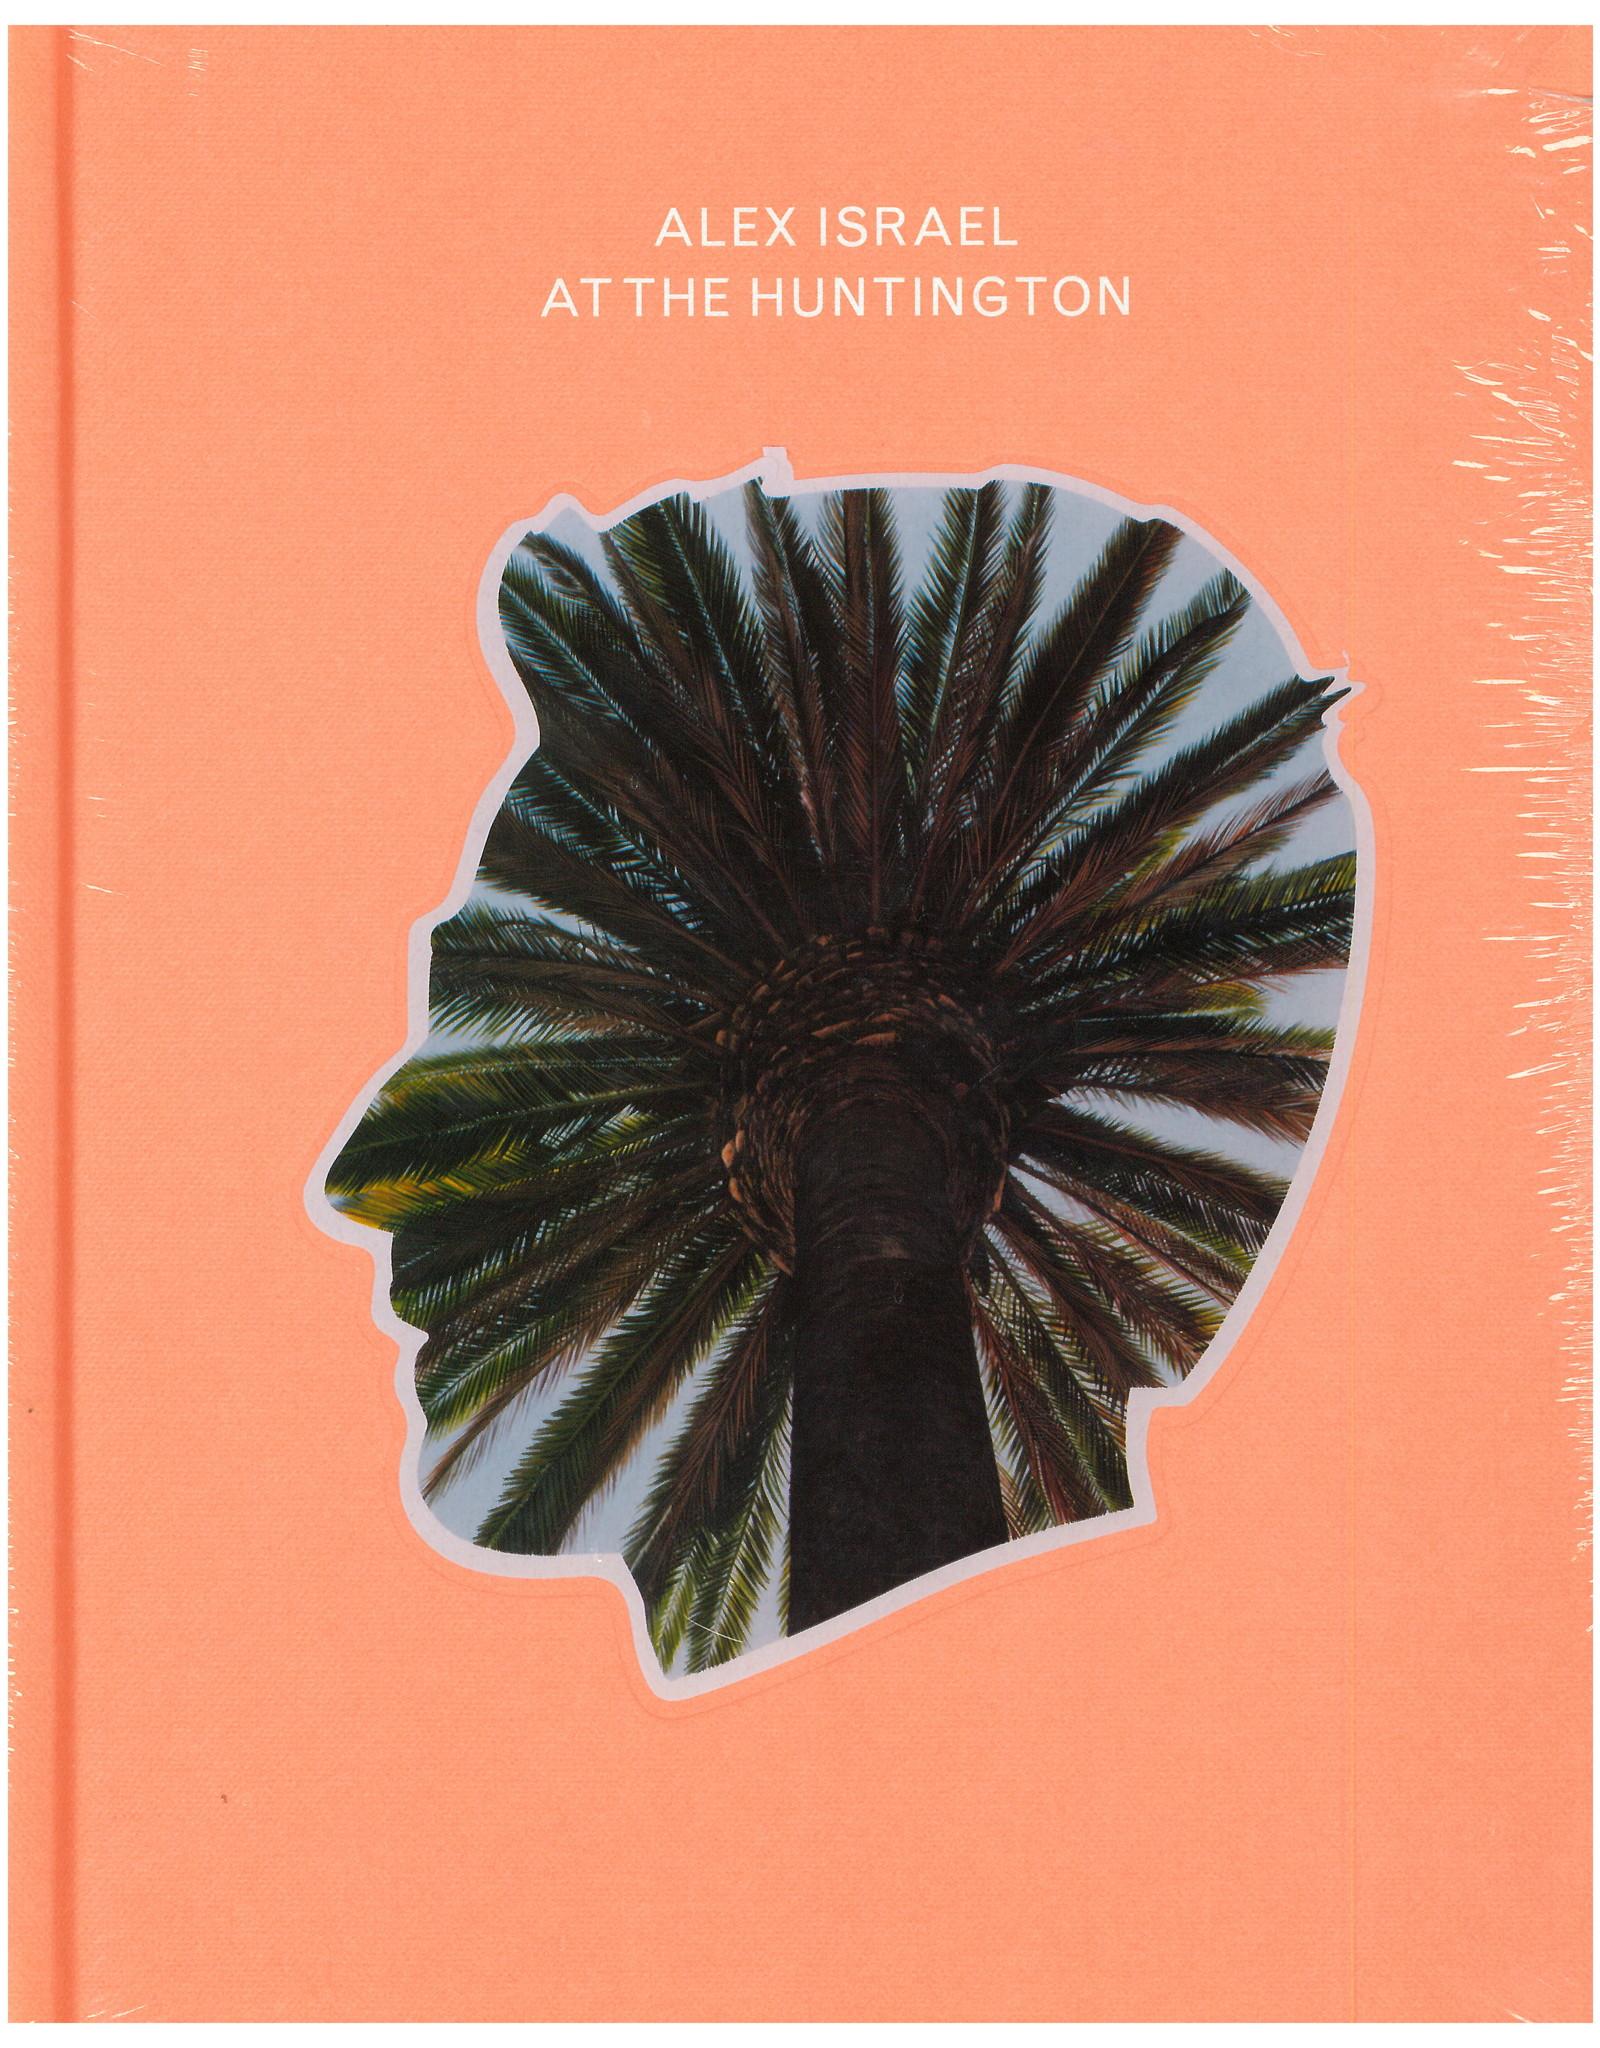 Alex Israel at The Huntington